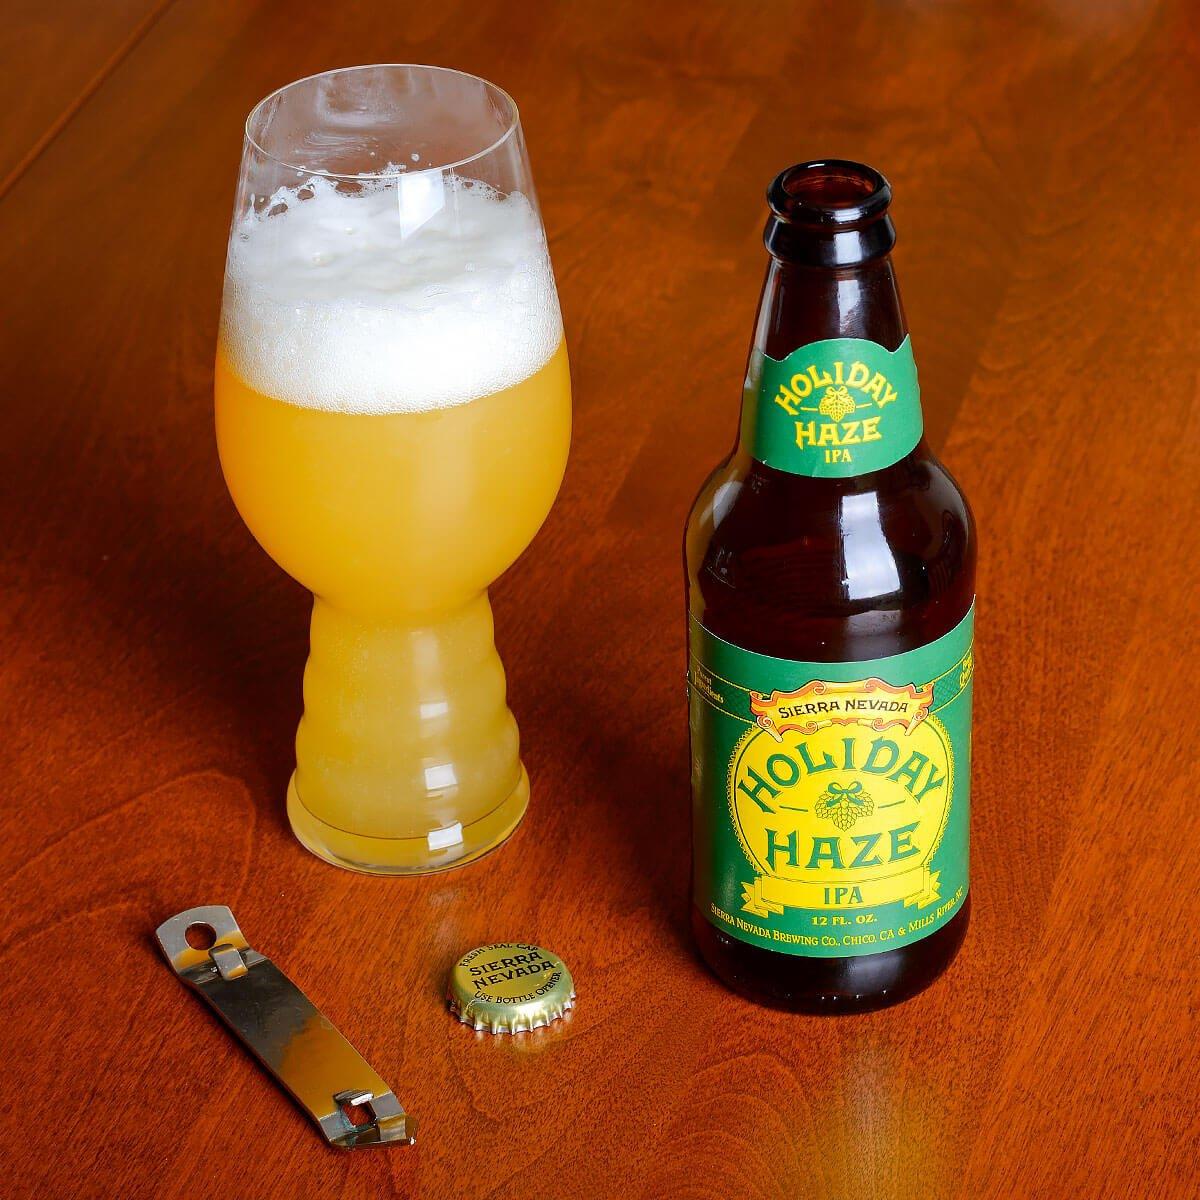 Holiday Haze IPA, an American IPA by Sierra Nevada Brewing Co.